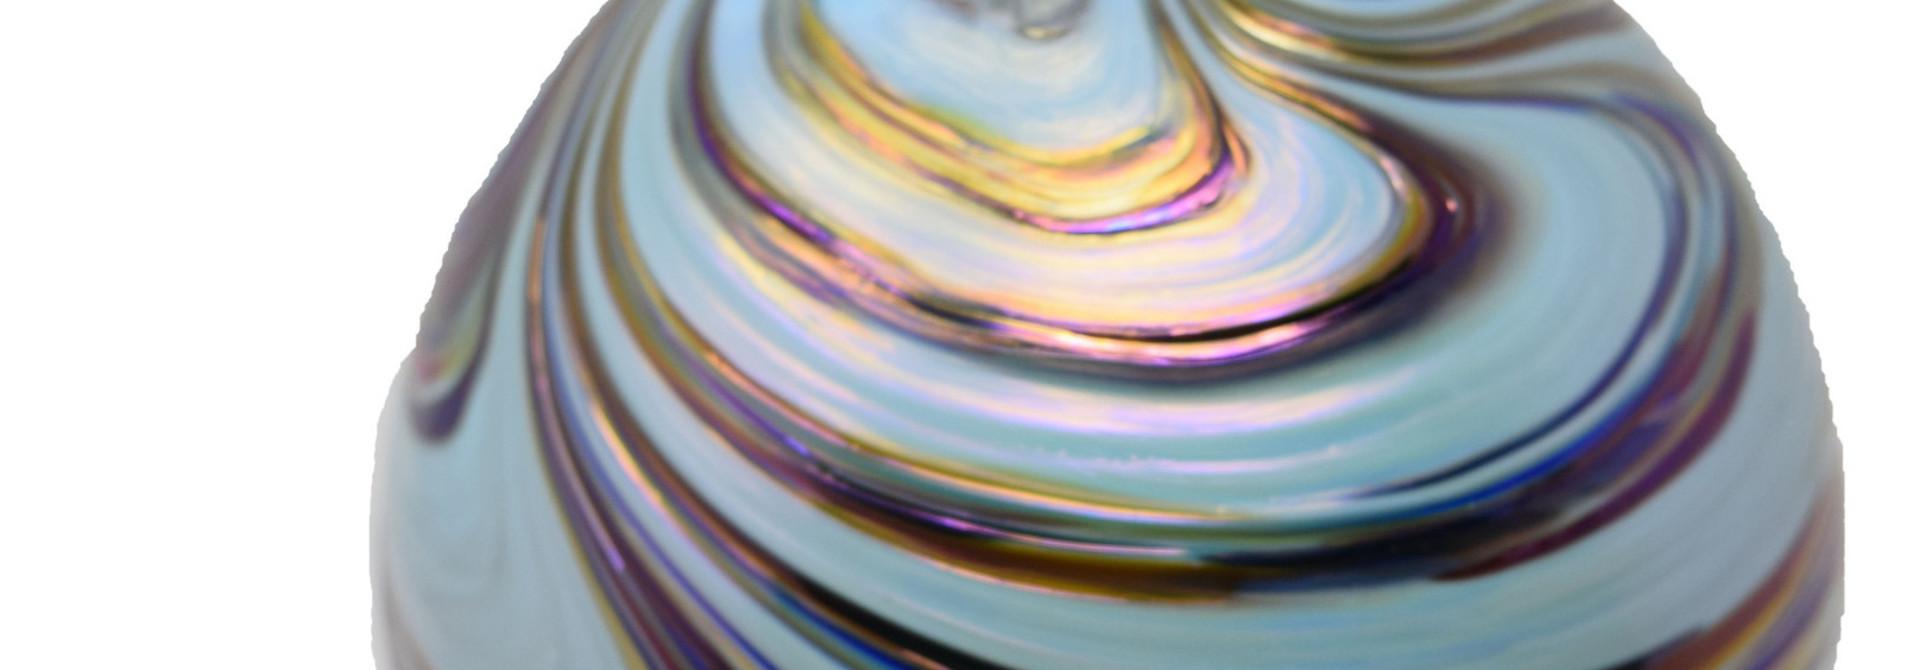 Gentle Swirl Ornament